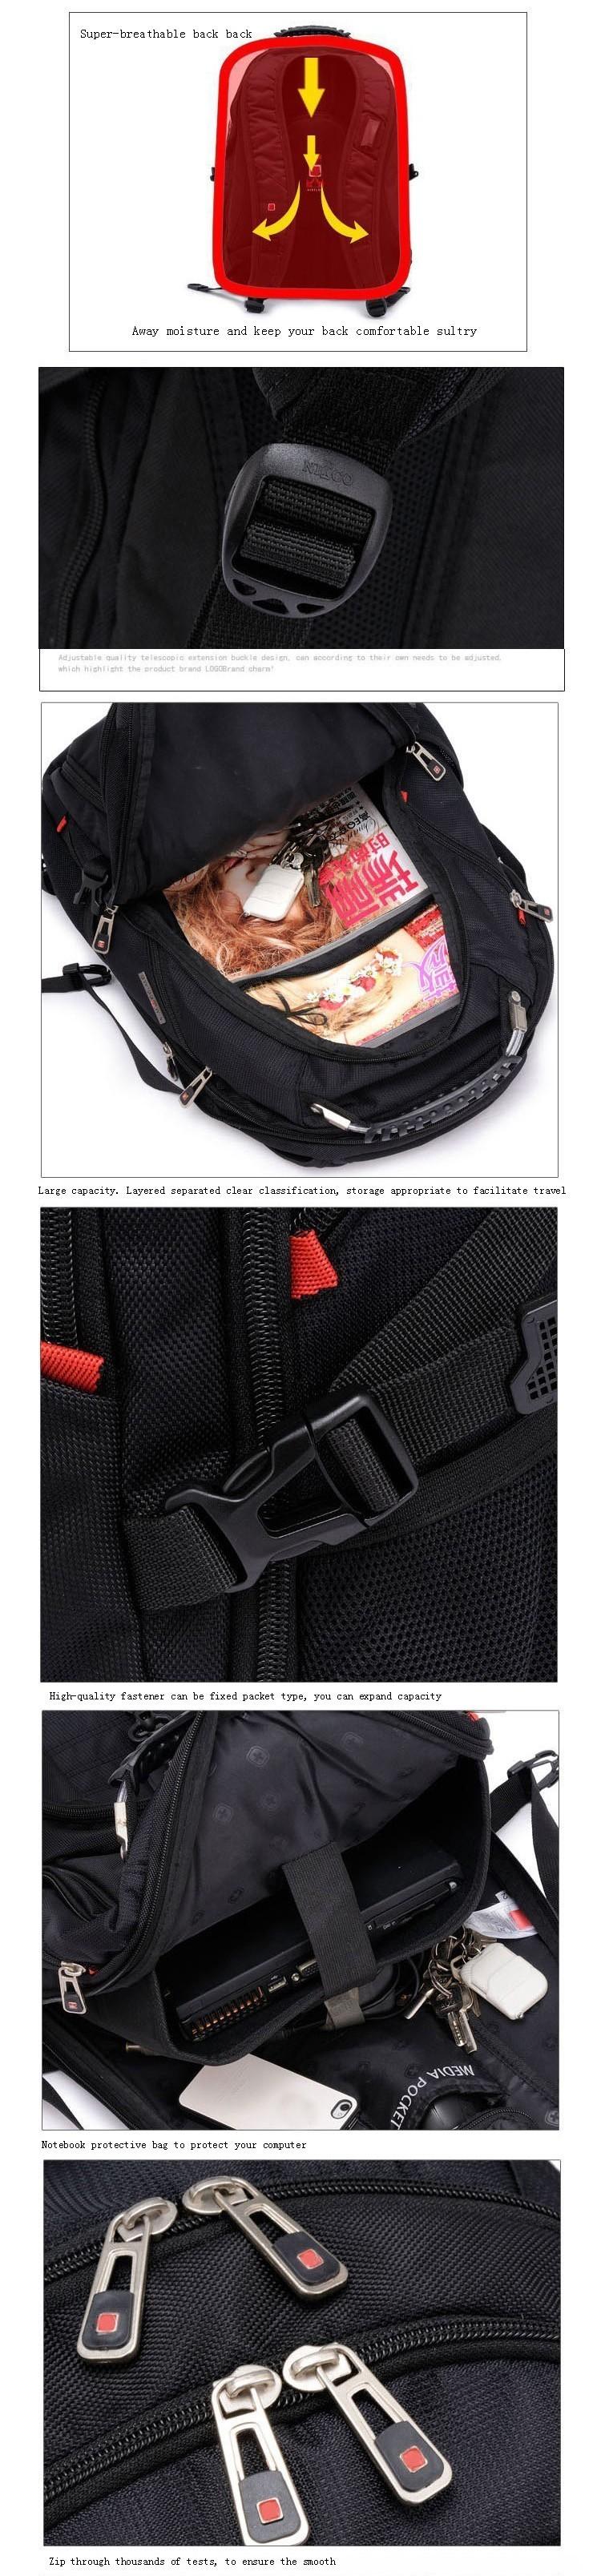 MAGIC UNION Oxford Men Laptop Backpack Mochila Masculina 15 Inch Man's Backpacks Men's Luggage & Travel bags Wholesale 6